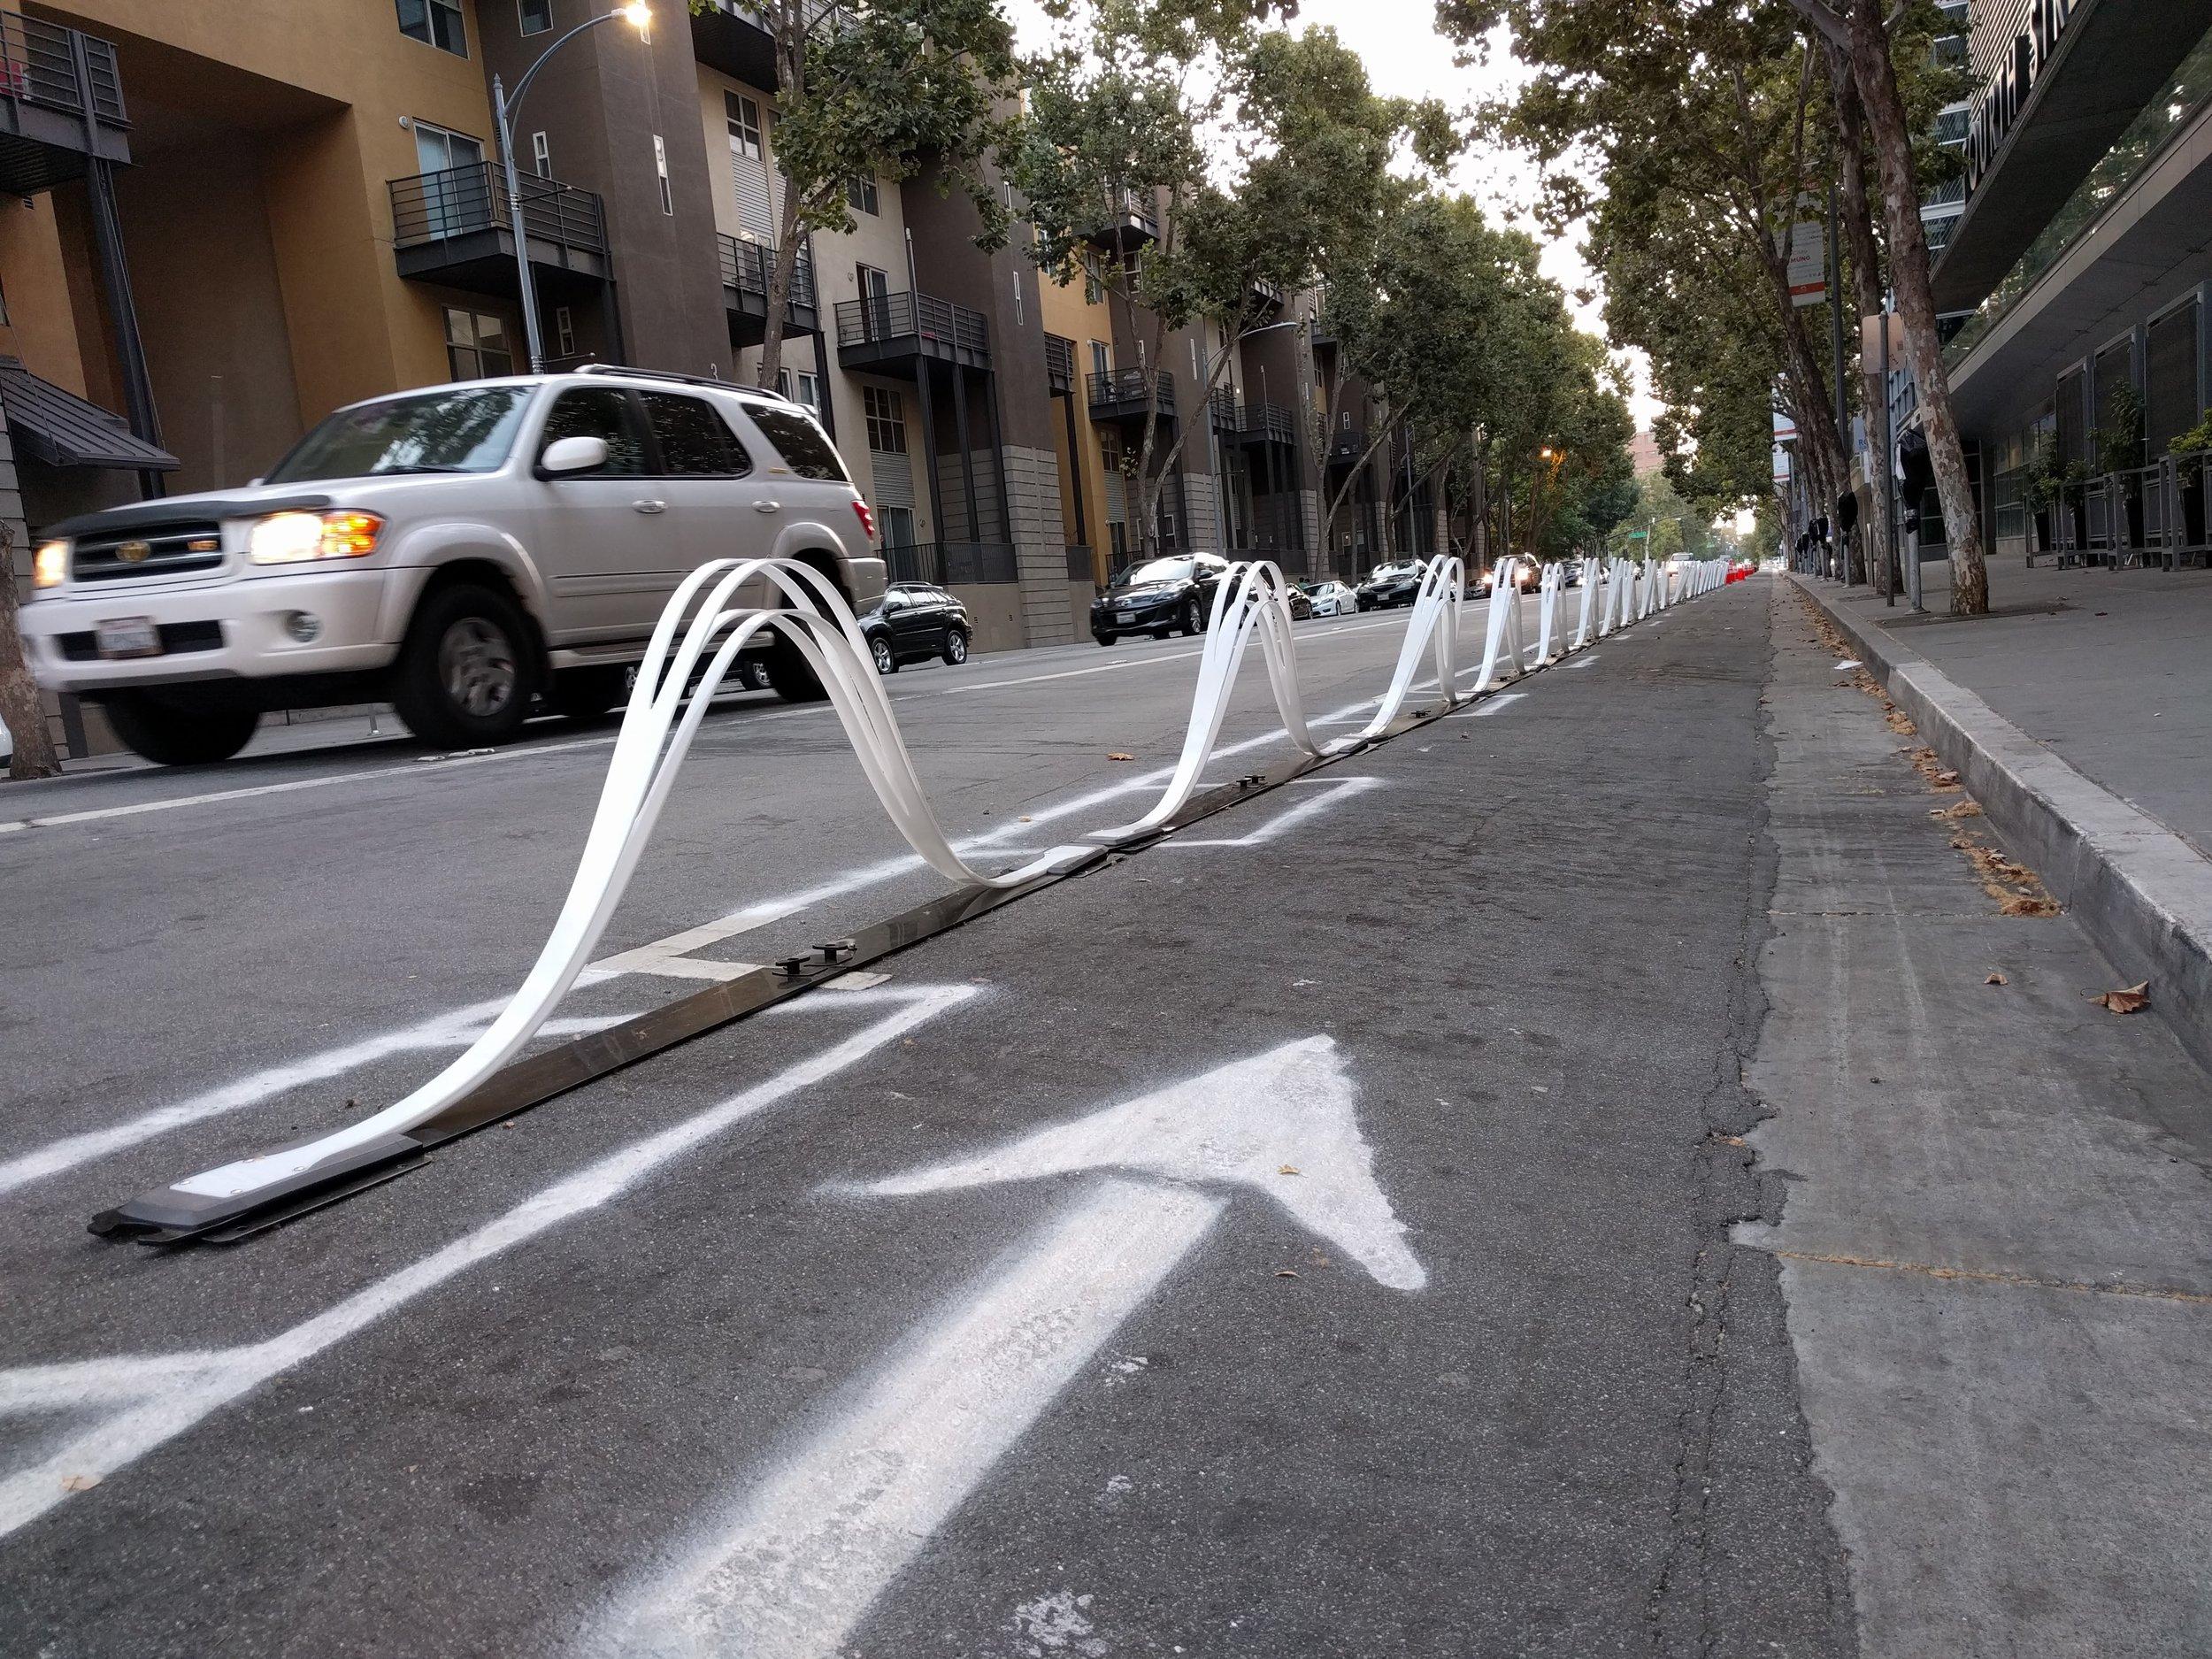 Pop-up protected bike lane in San Jose, CA. Photo credit: City of San Jose